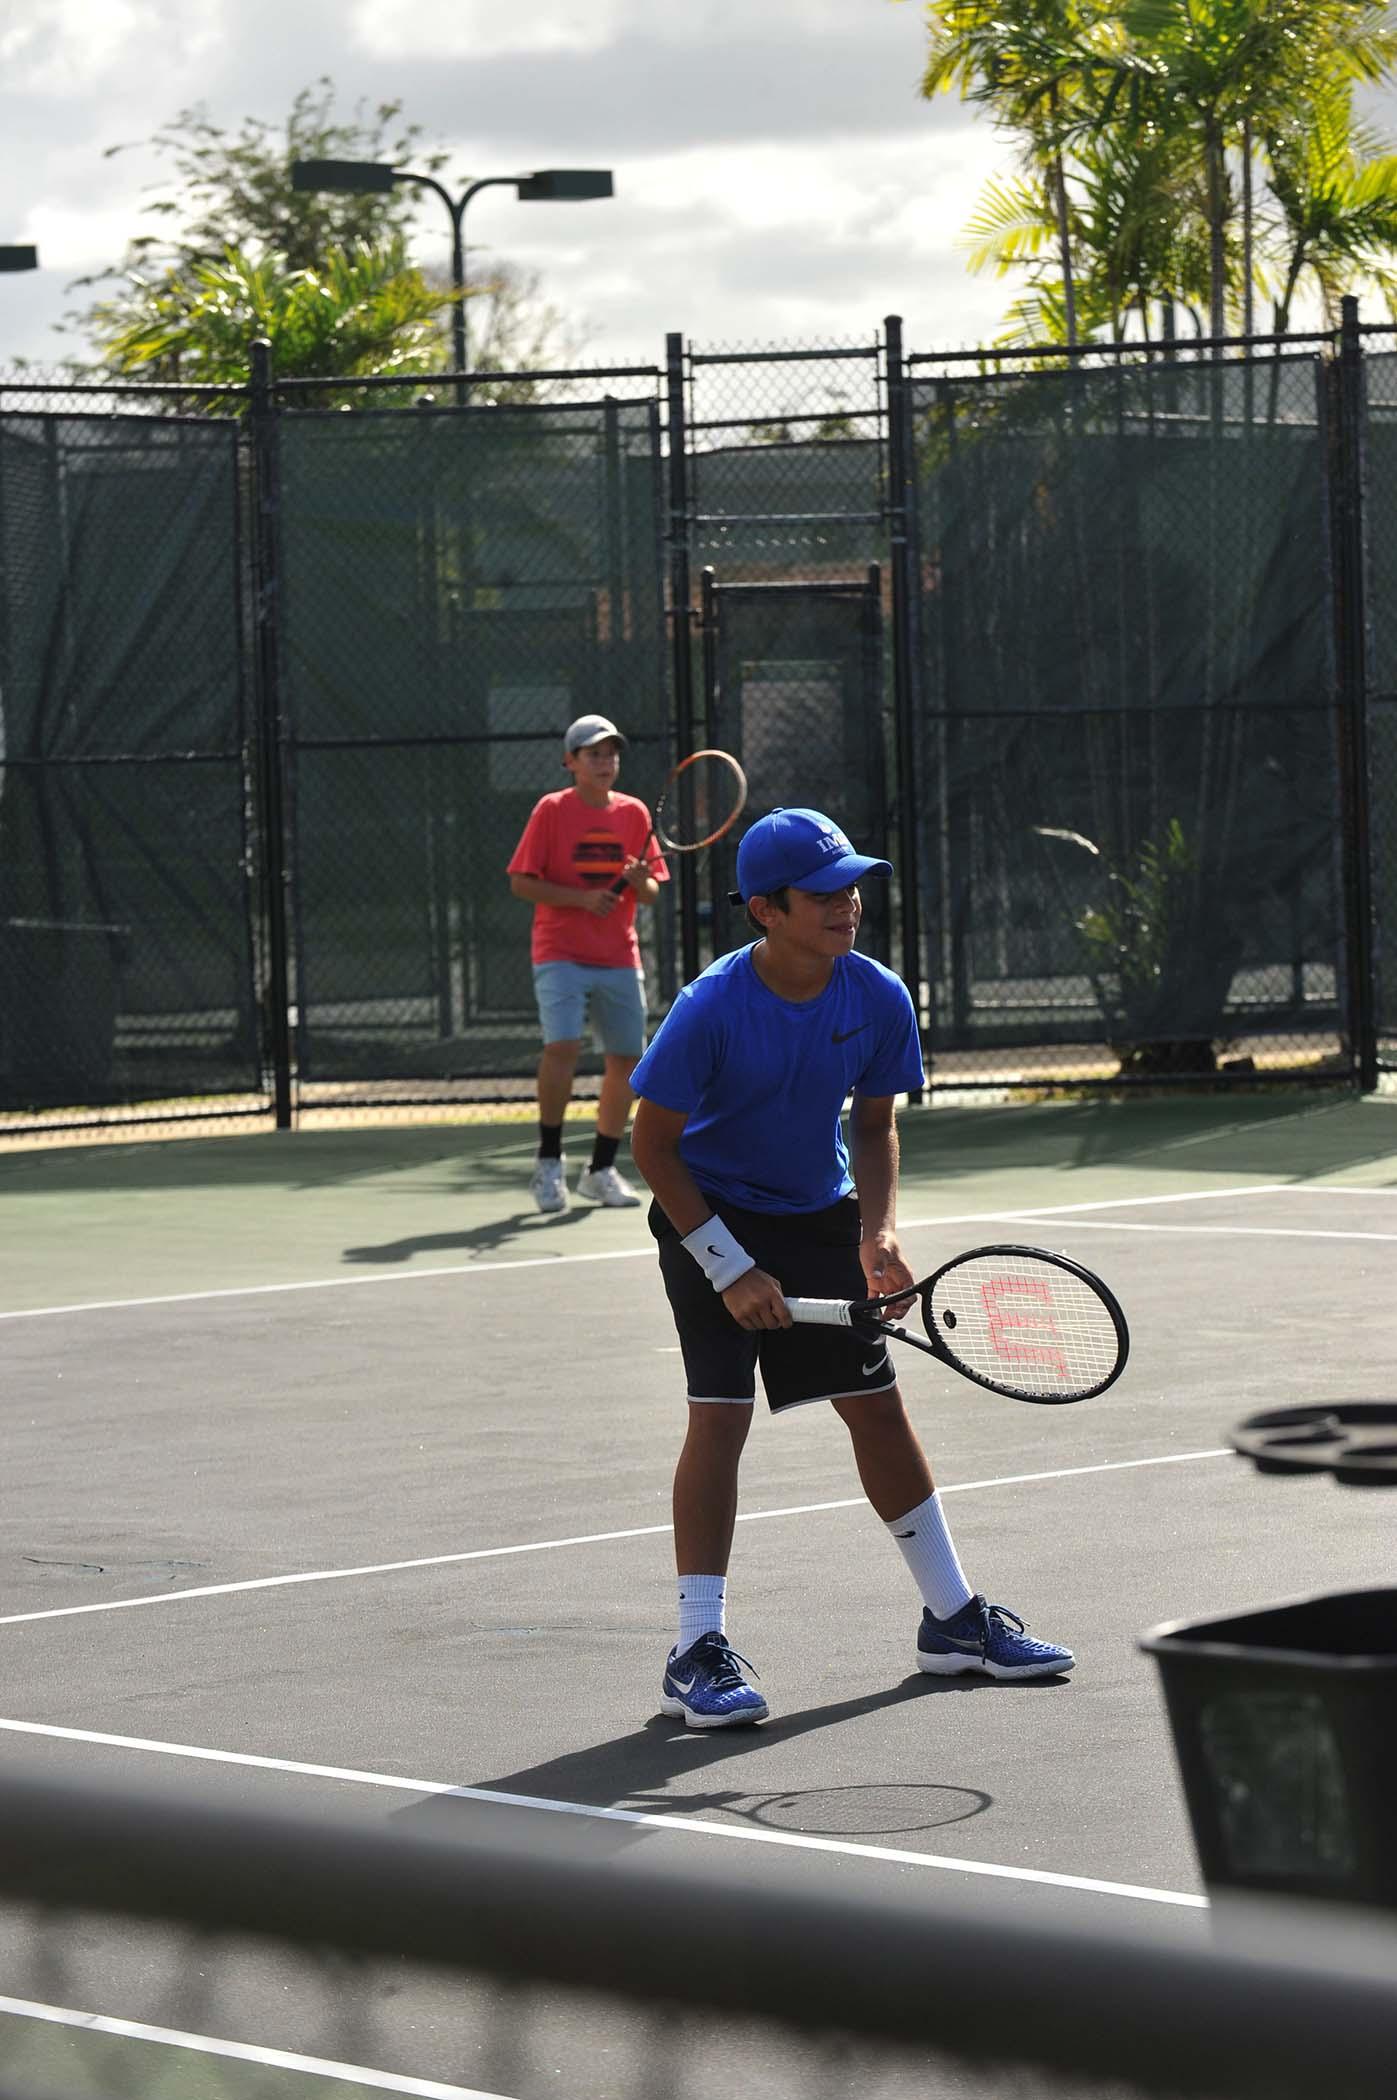 Participantes Tenis Juvenil-2-24-2018-26.jpg